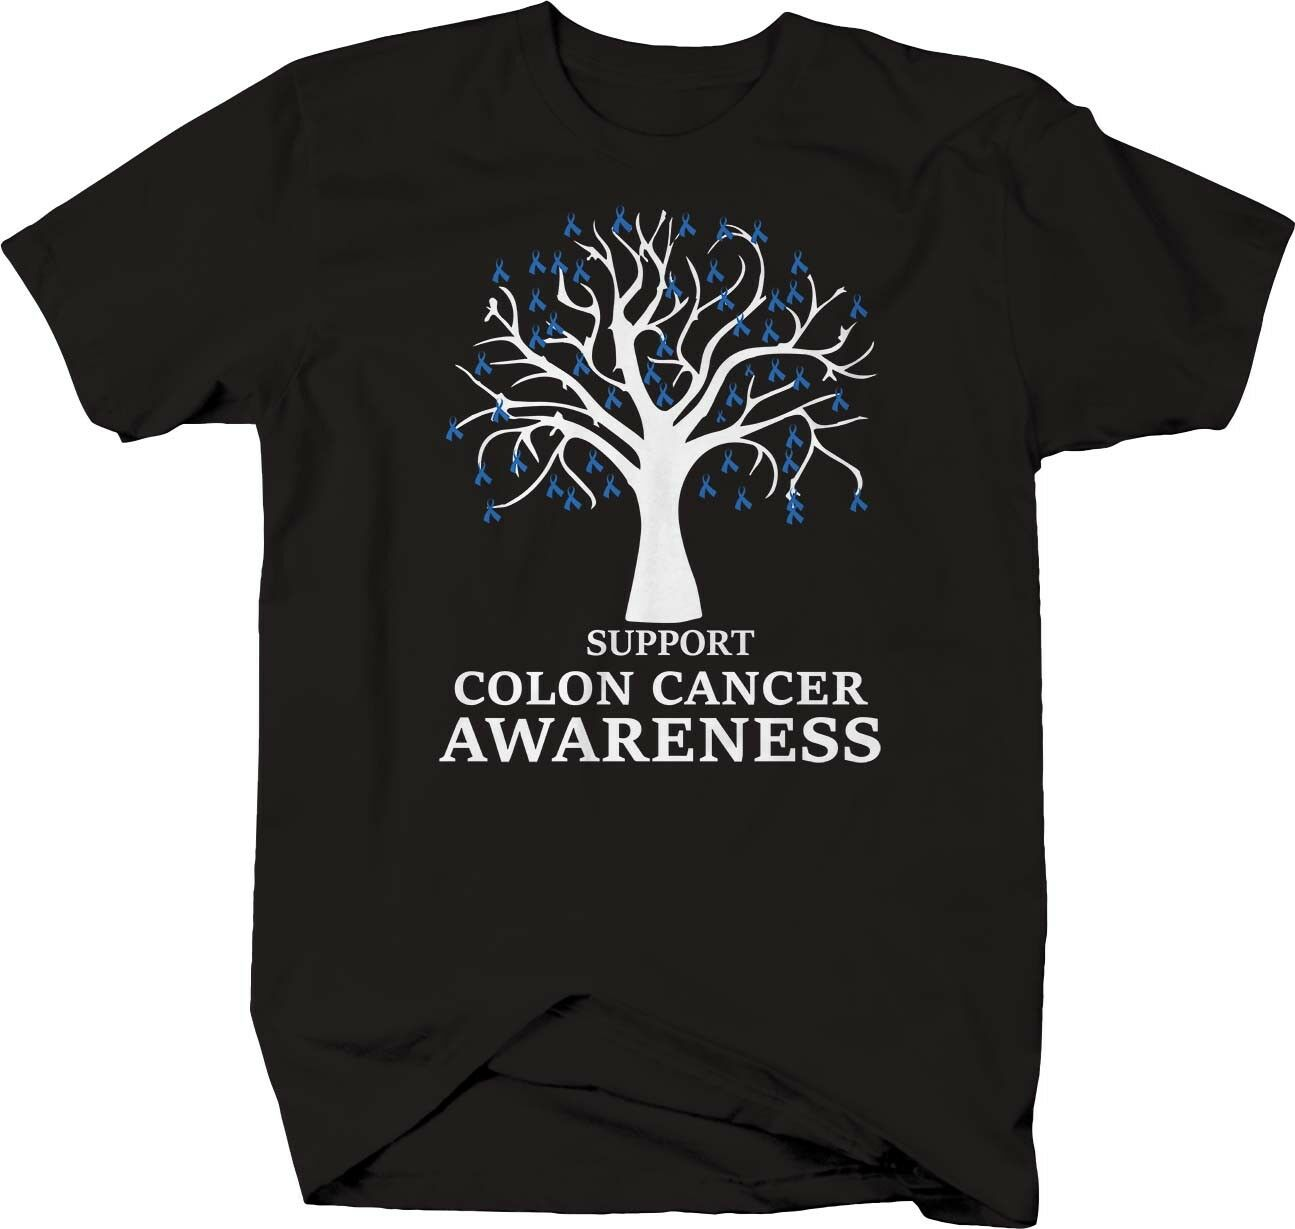 Apoyo de cáncer de Colon conciencia árbol camiseta con lazo Tee camisa de manga corta